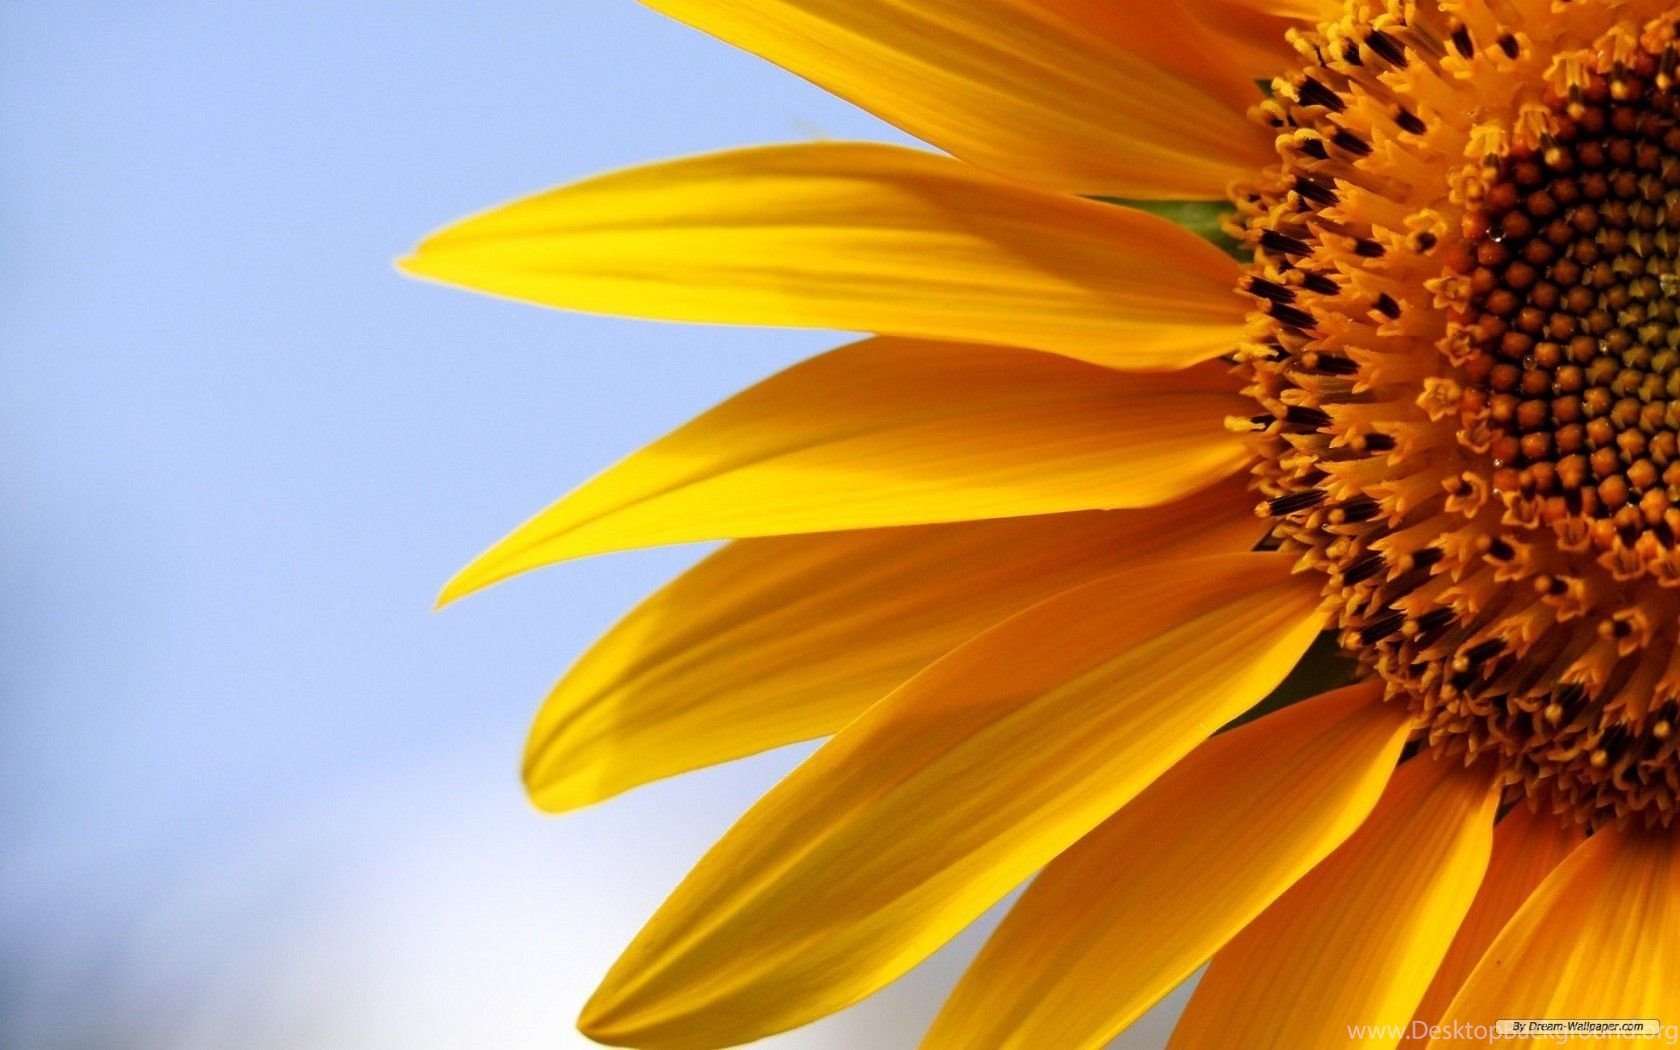 152 1528983 free wallpapers free flower wallpapers sunflower flowers sunflower